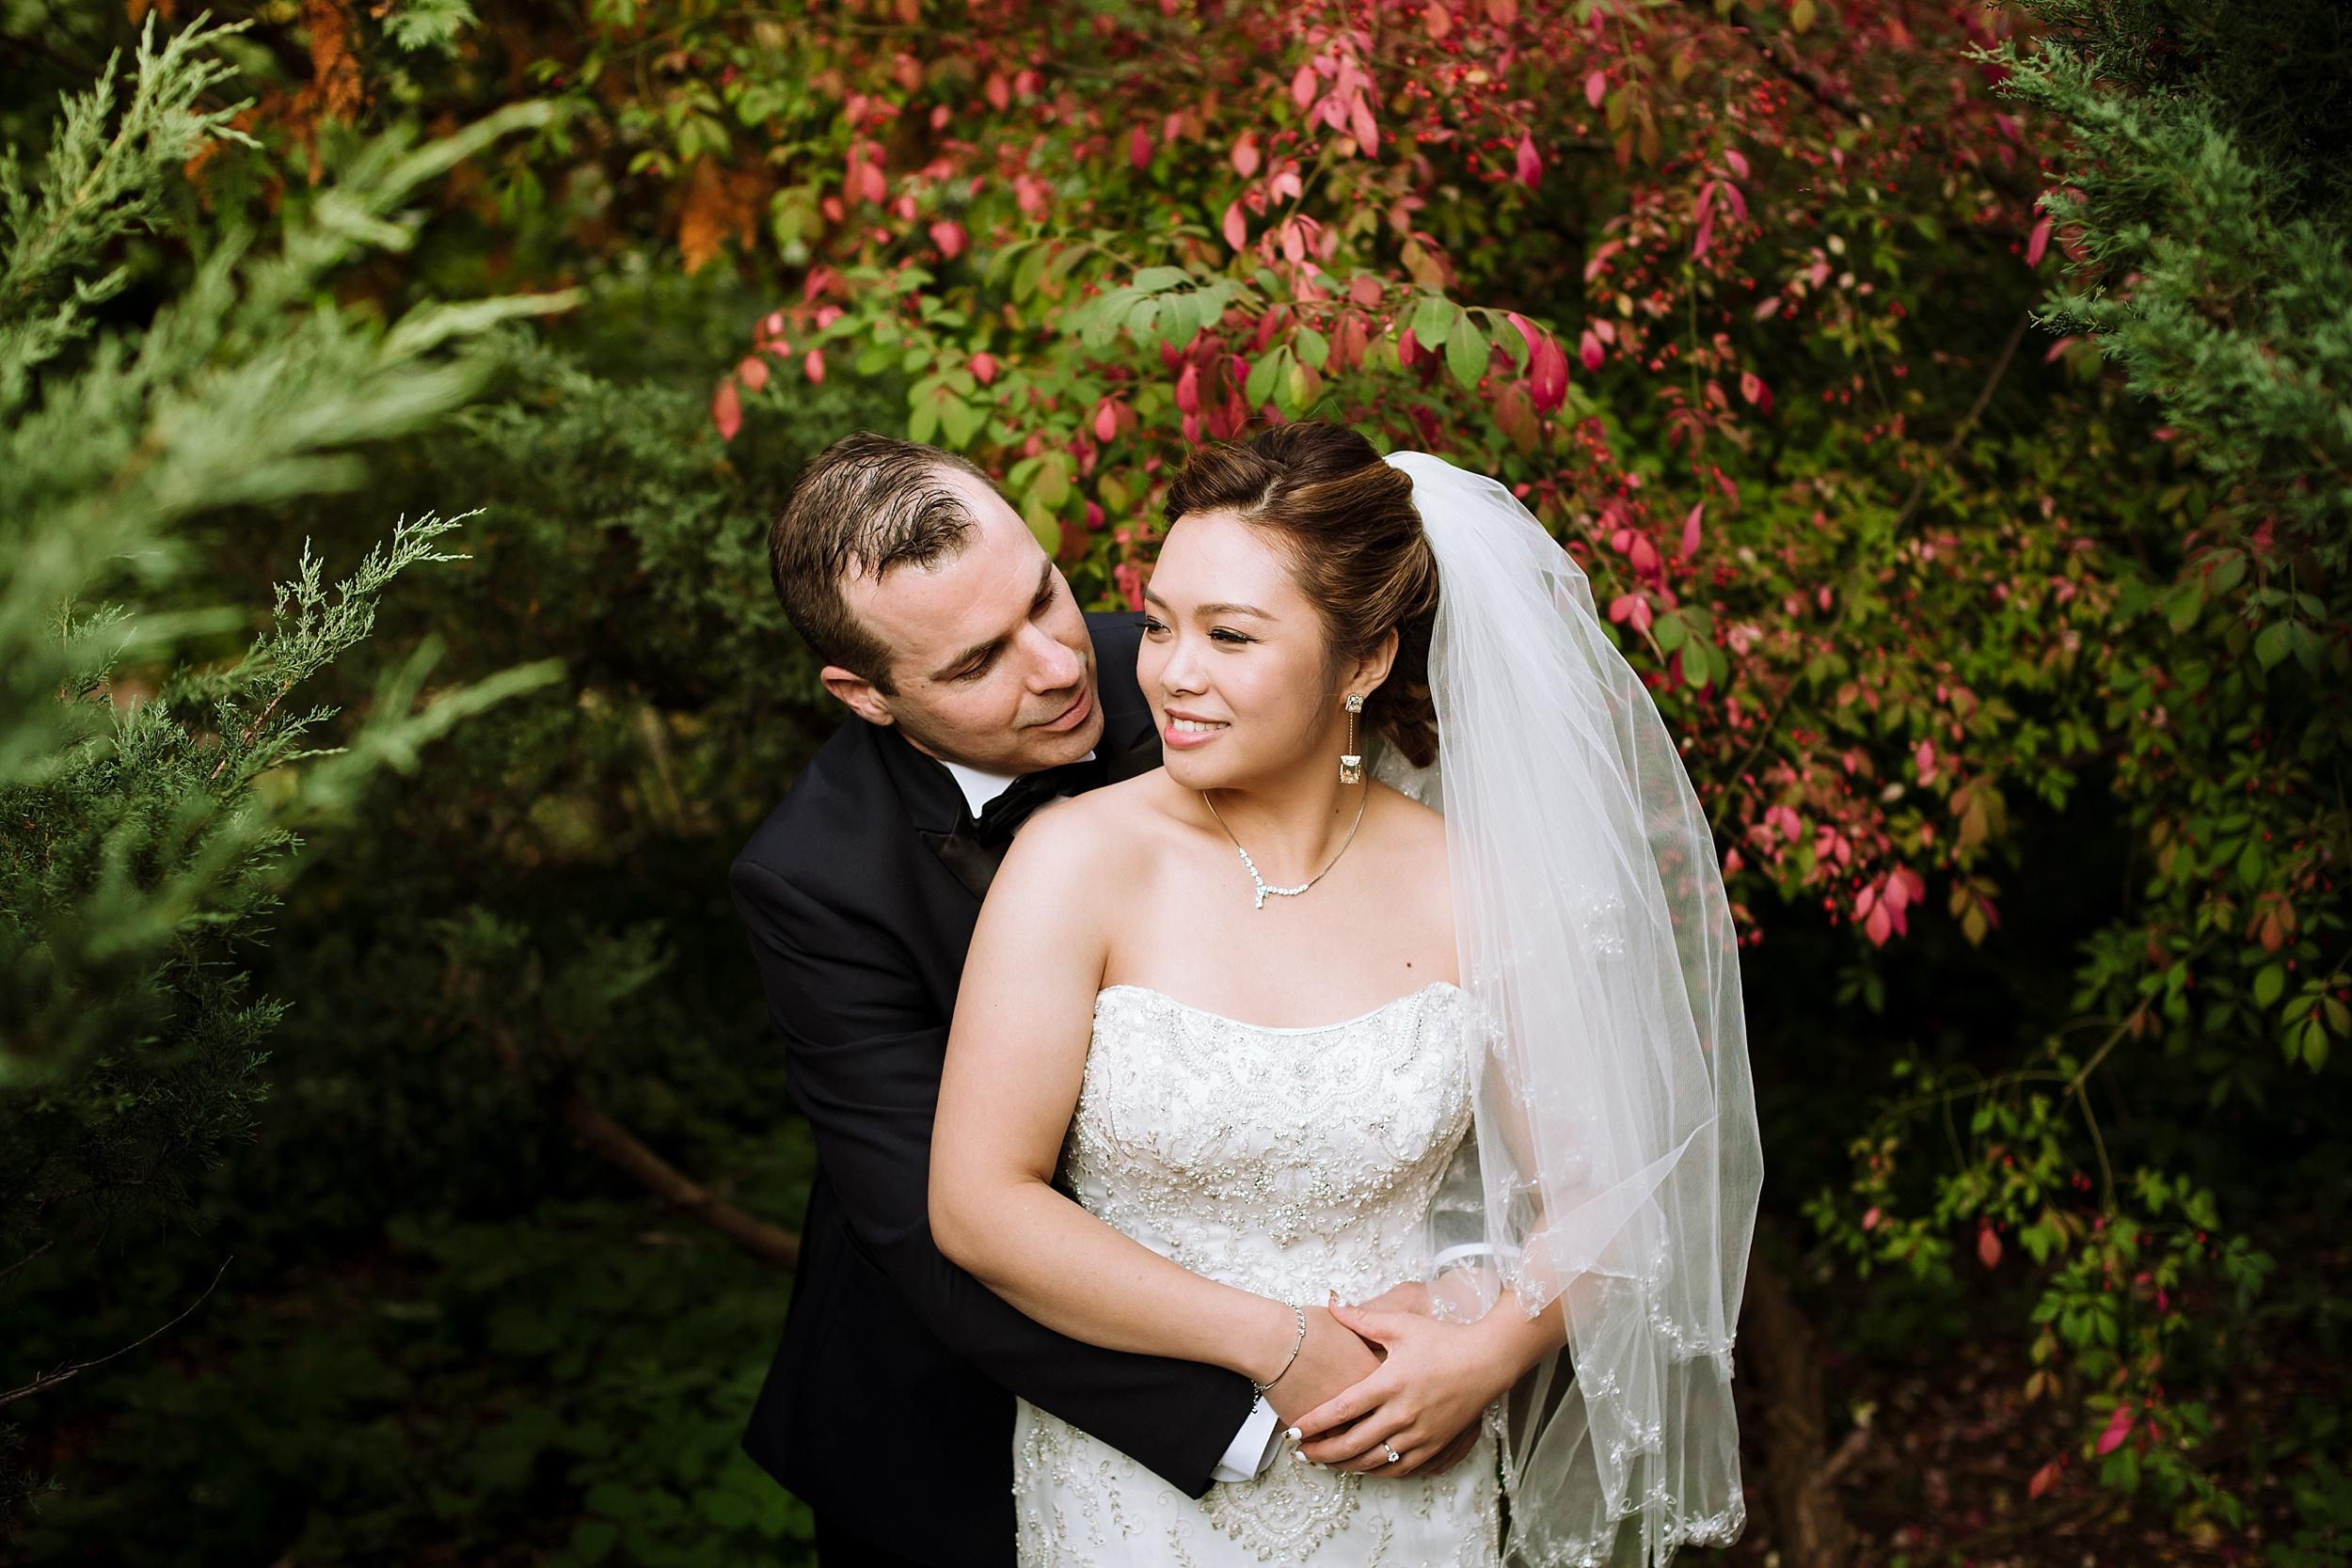 Sunnybrook_Estates_Alexander_Muir_Toronto_Wedding_Photographer_0011.jpg